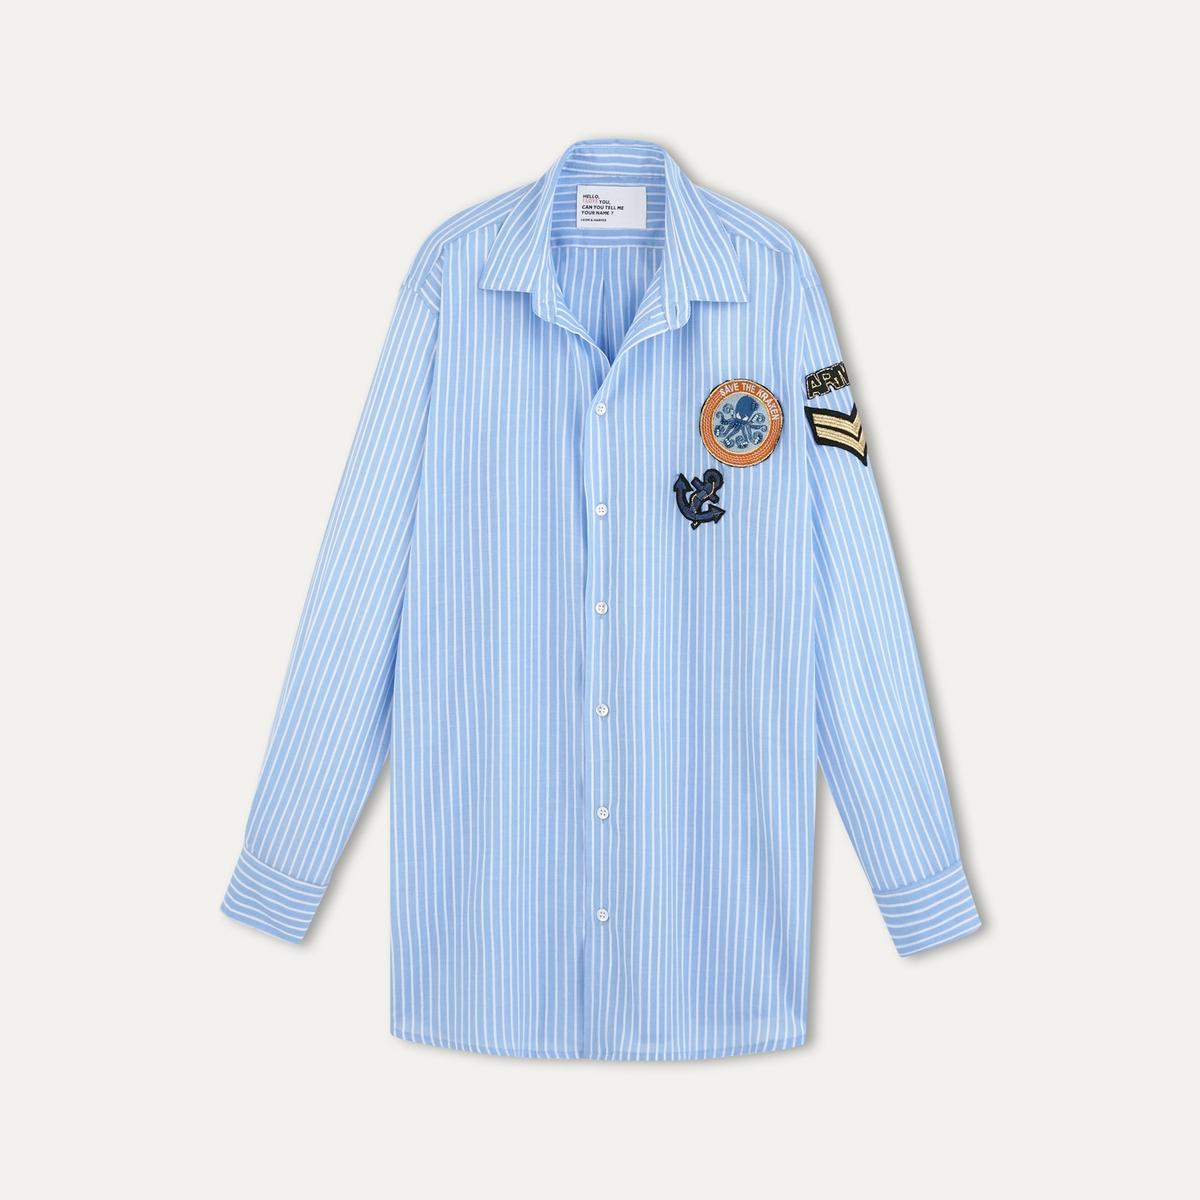 Рубашка CHILLOСостав и описание    Материал: вуаль 100% хлопок   Марка: LEON AND HARPER<br><br>Цвет: синий<br>Размер: S.M